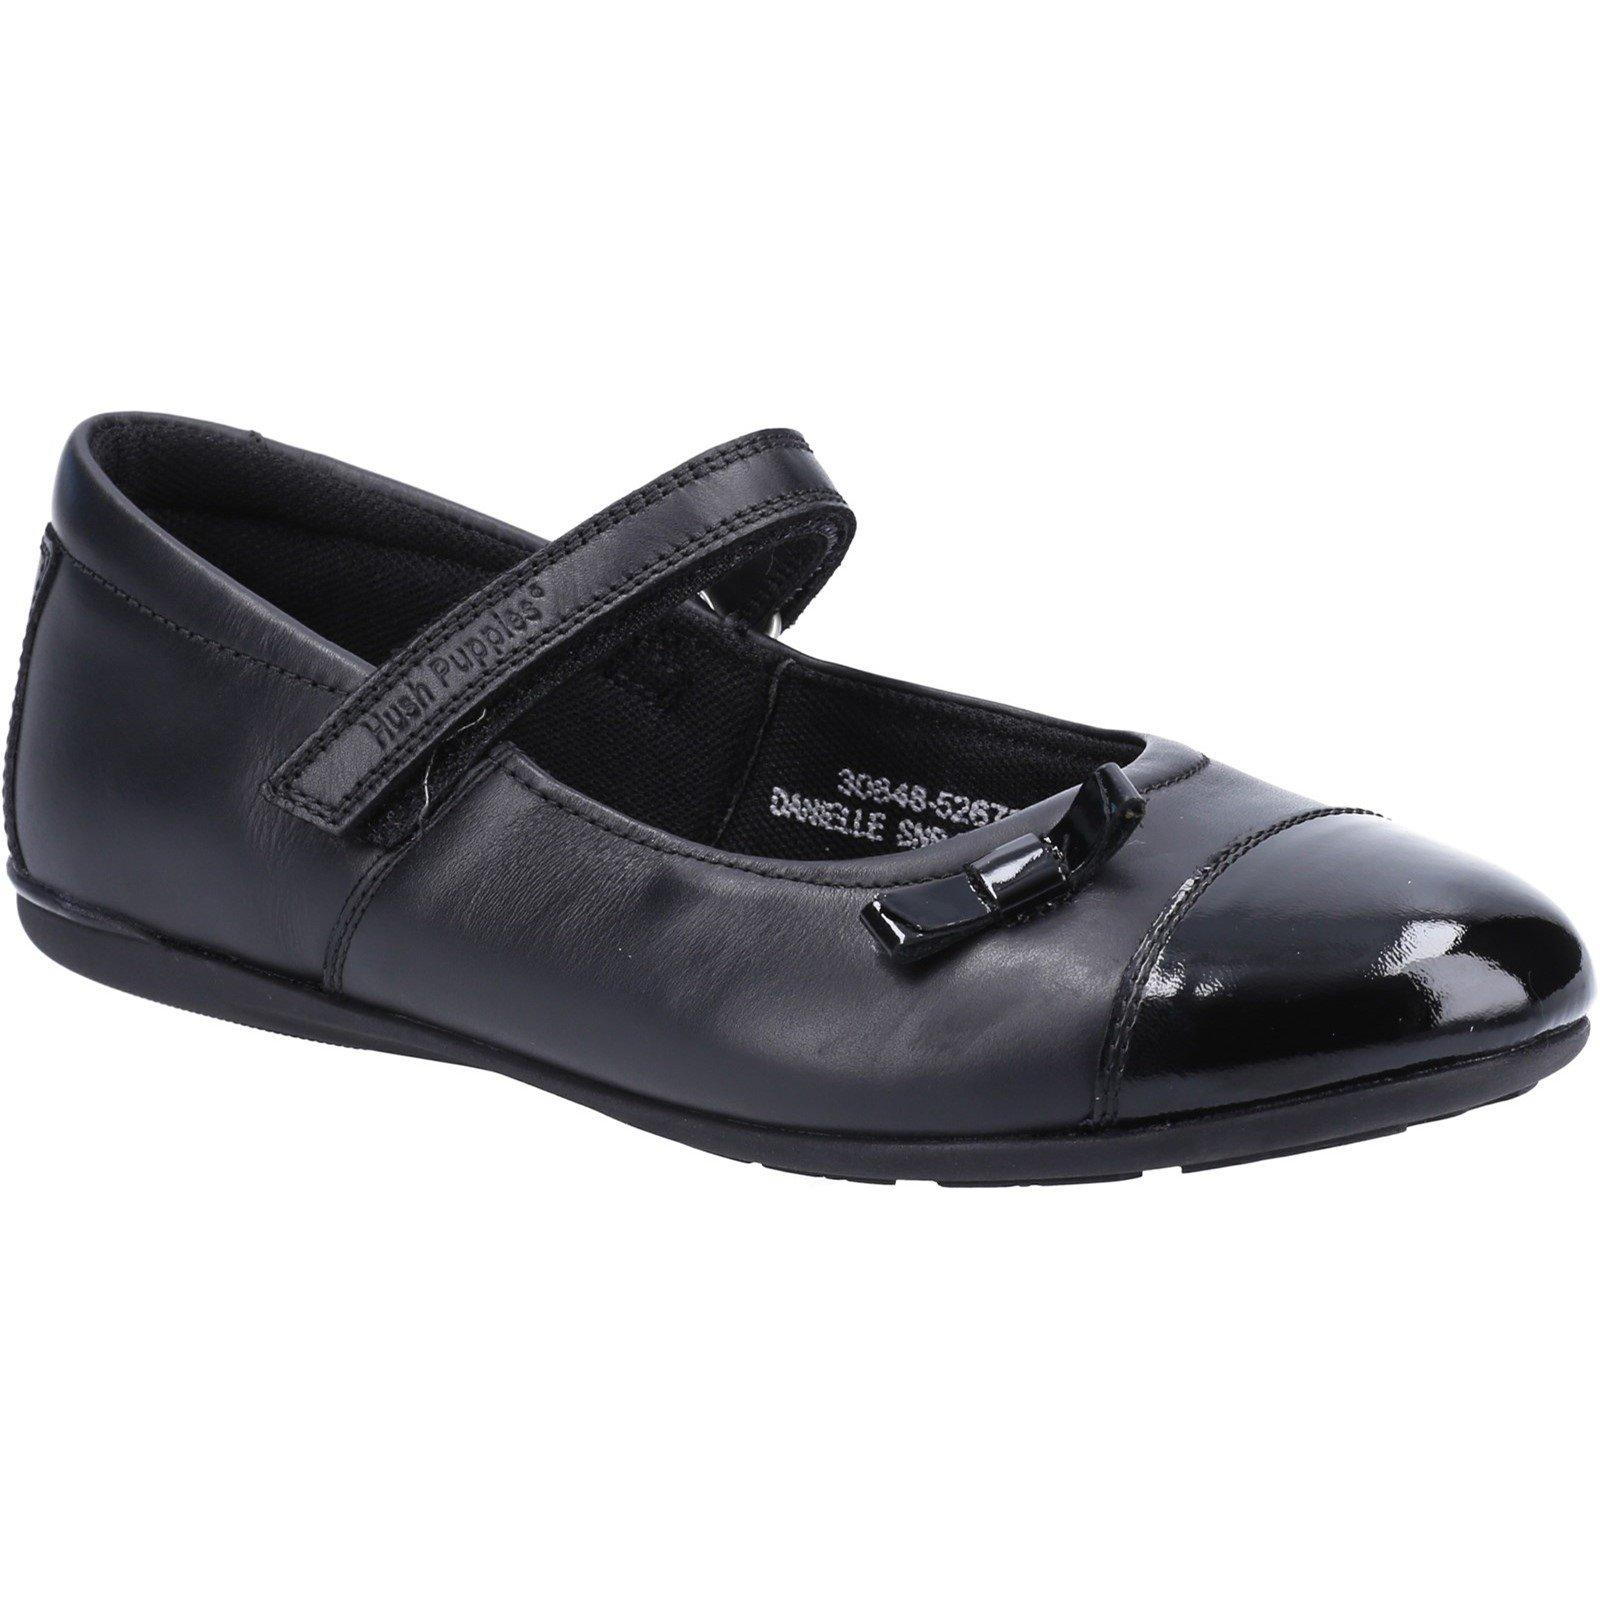 Hush Puppies Kid's Danielle Junior School Shoe Black 30847 - Black 13